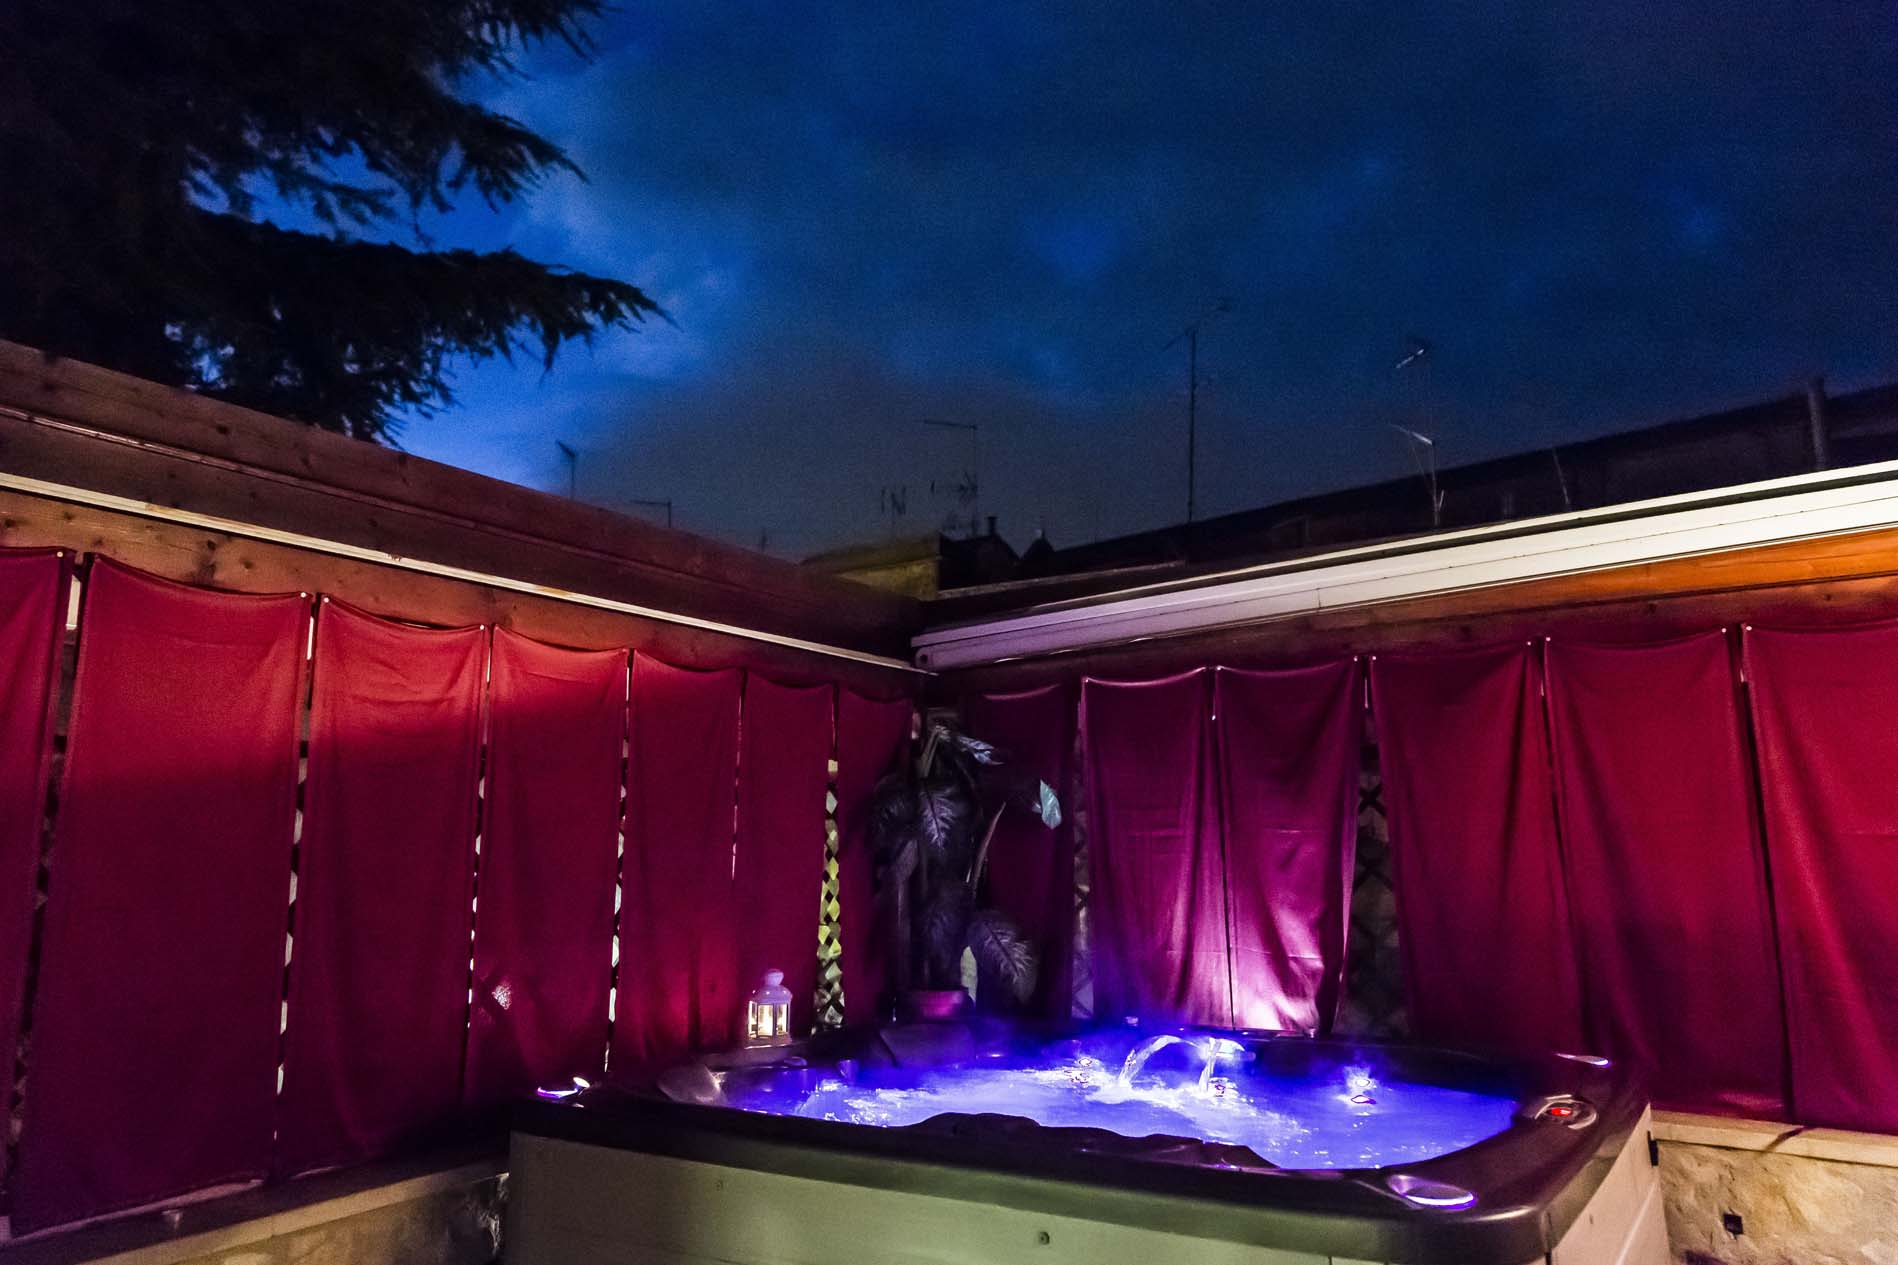 Diamond Roof - Bed & Breakfast a Tivoli